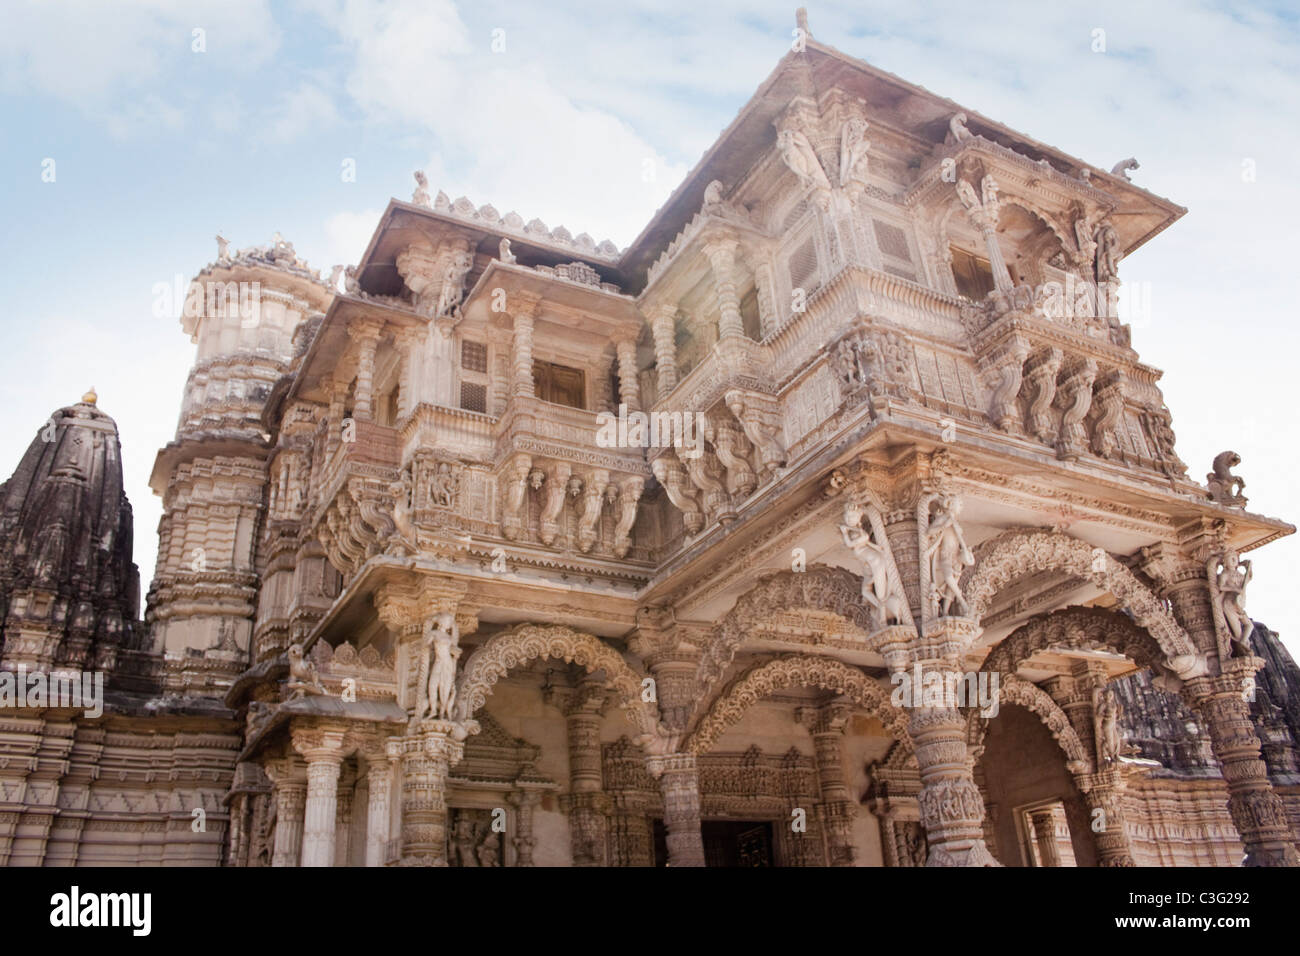 Low angle view of a temple, Swaminarayan Akshardham Temple, Ahmedabad, Gujarat, India - Stock Image